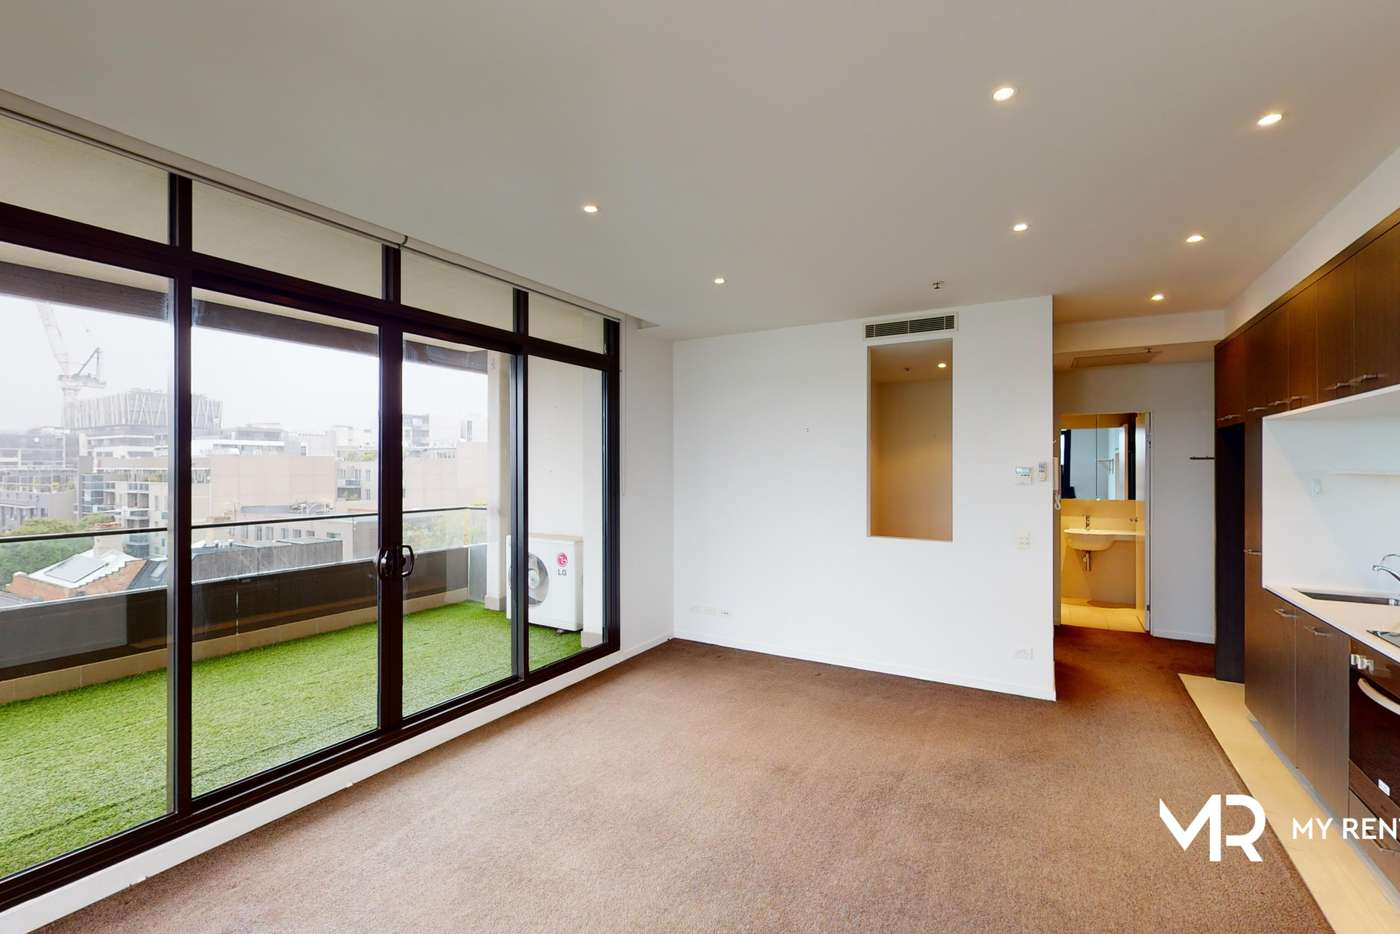 Main view of Homely unit listing, 516/2 McGoun Street, Richmond VIC 3121